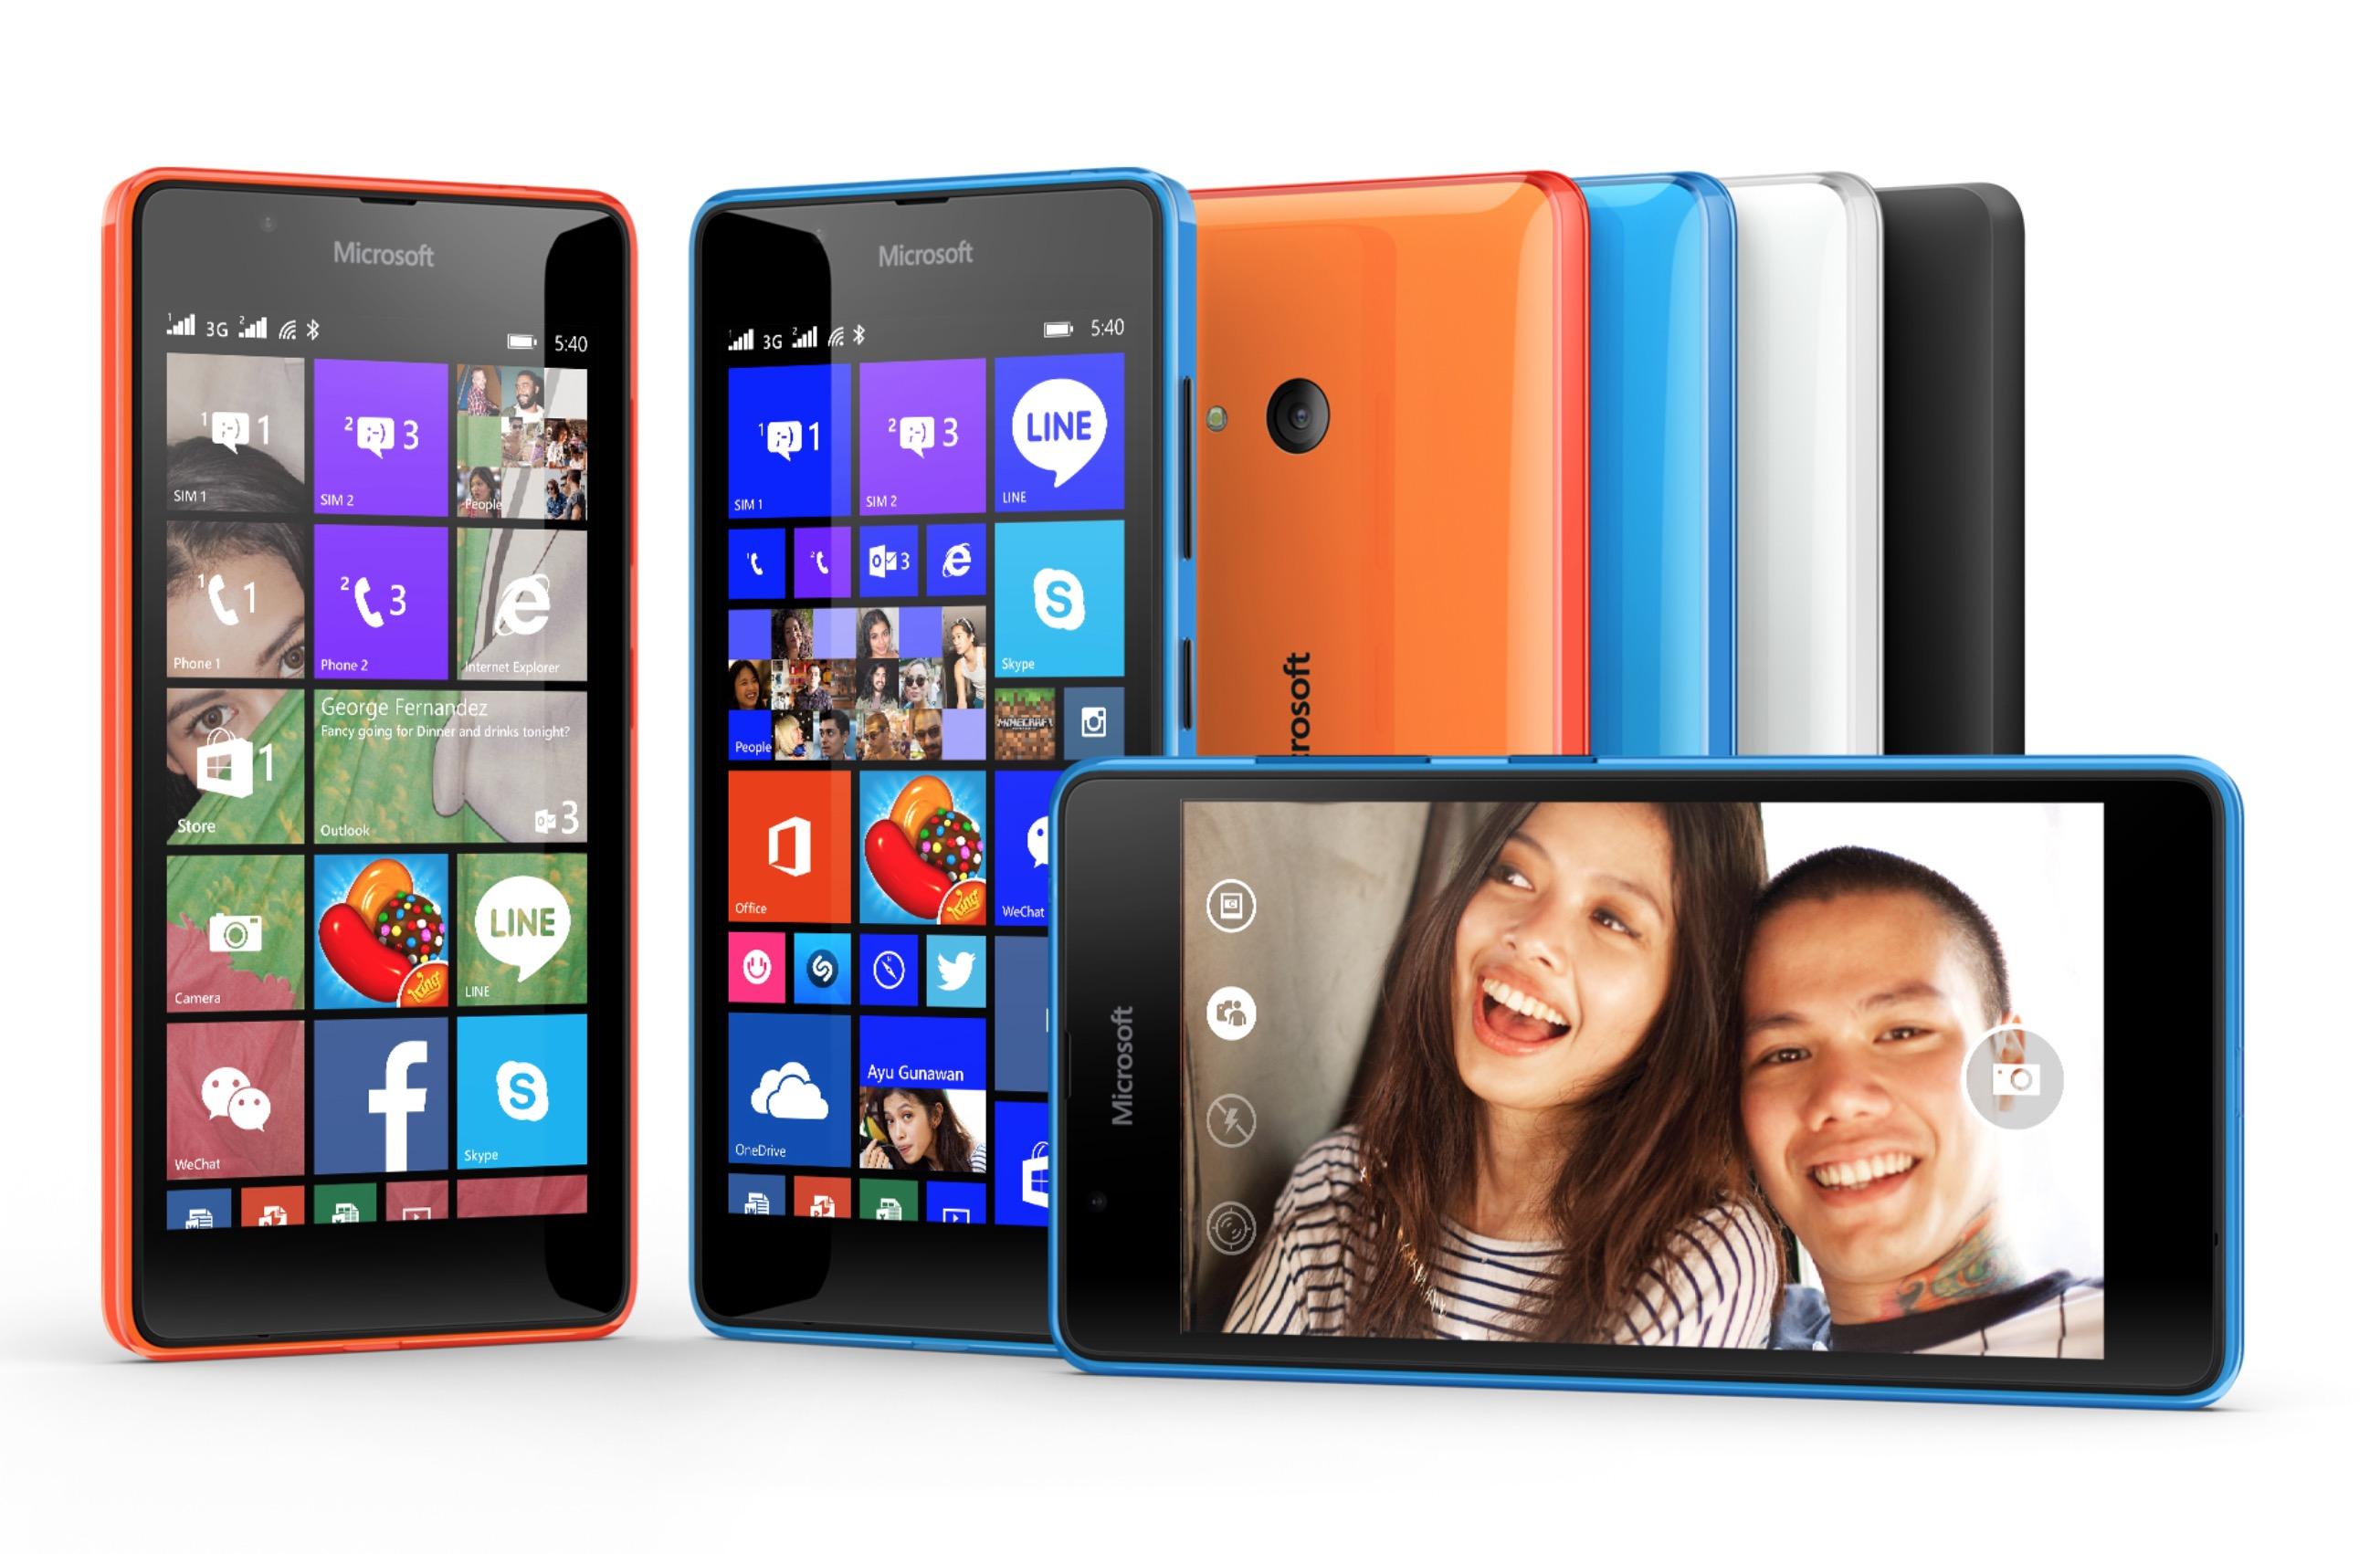 Nokia is Dead. Long Live Nokia!